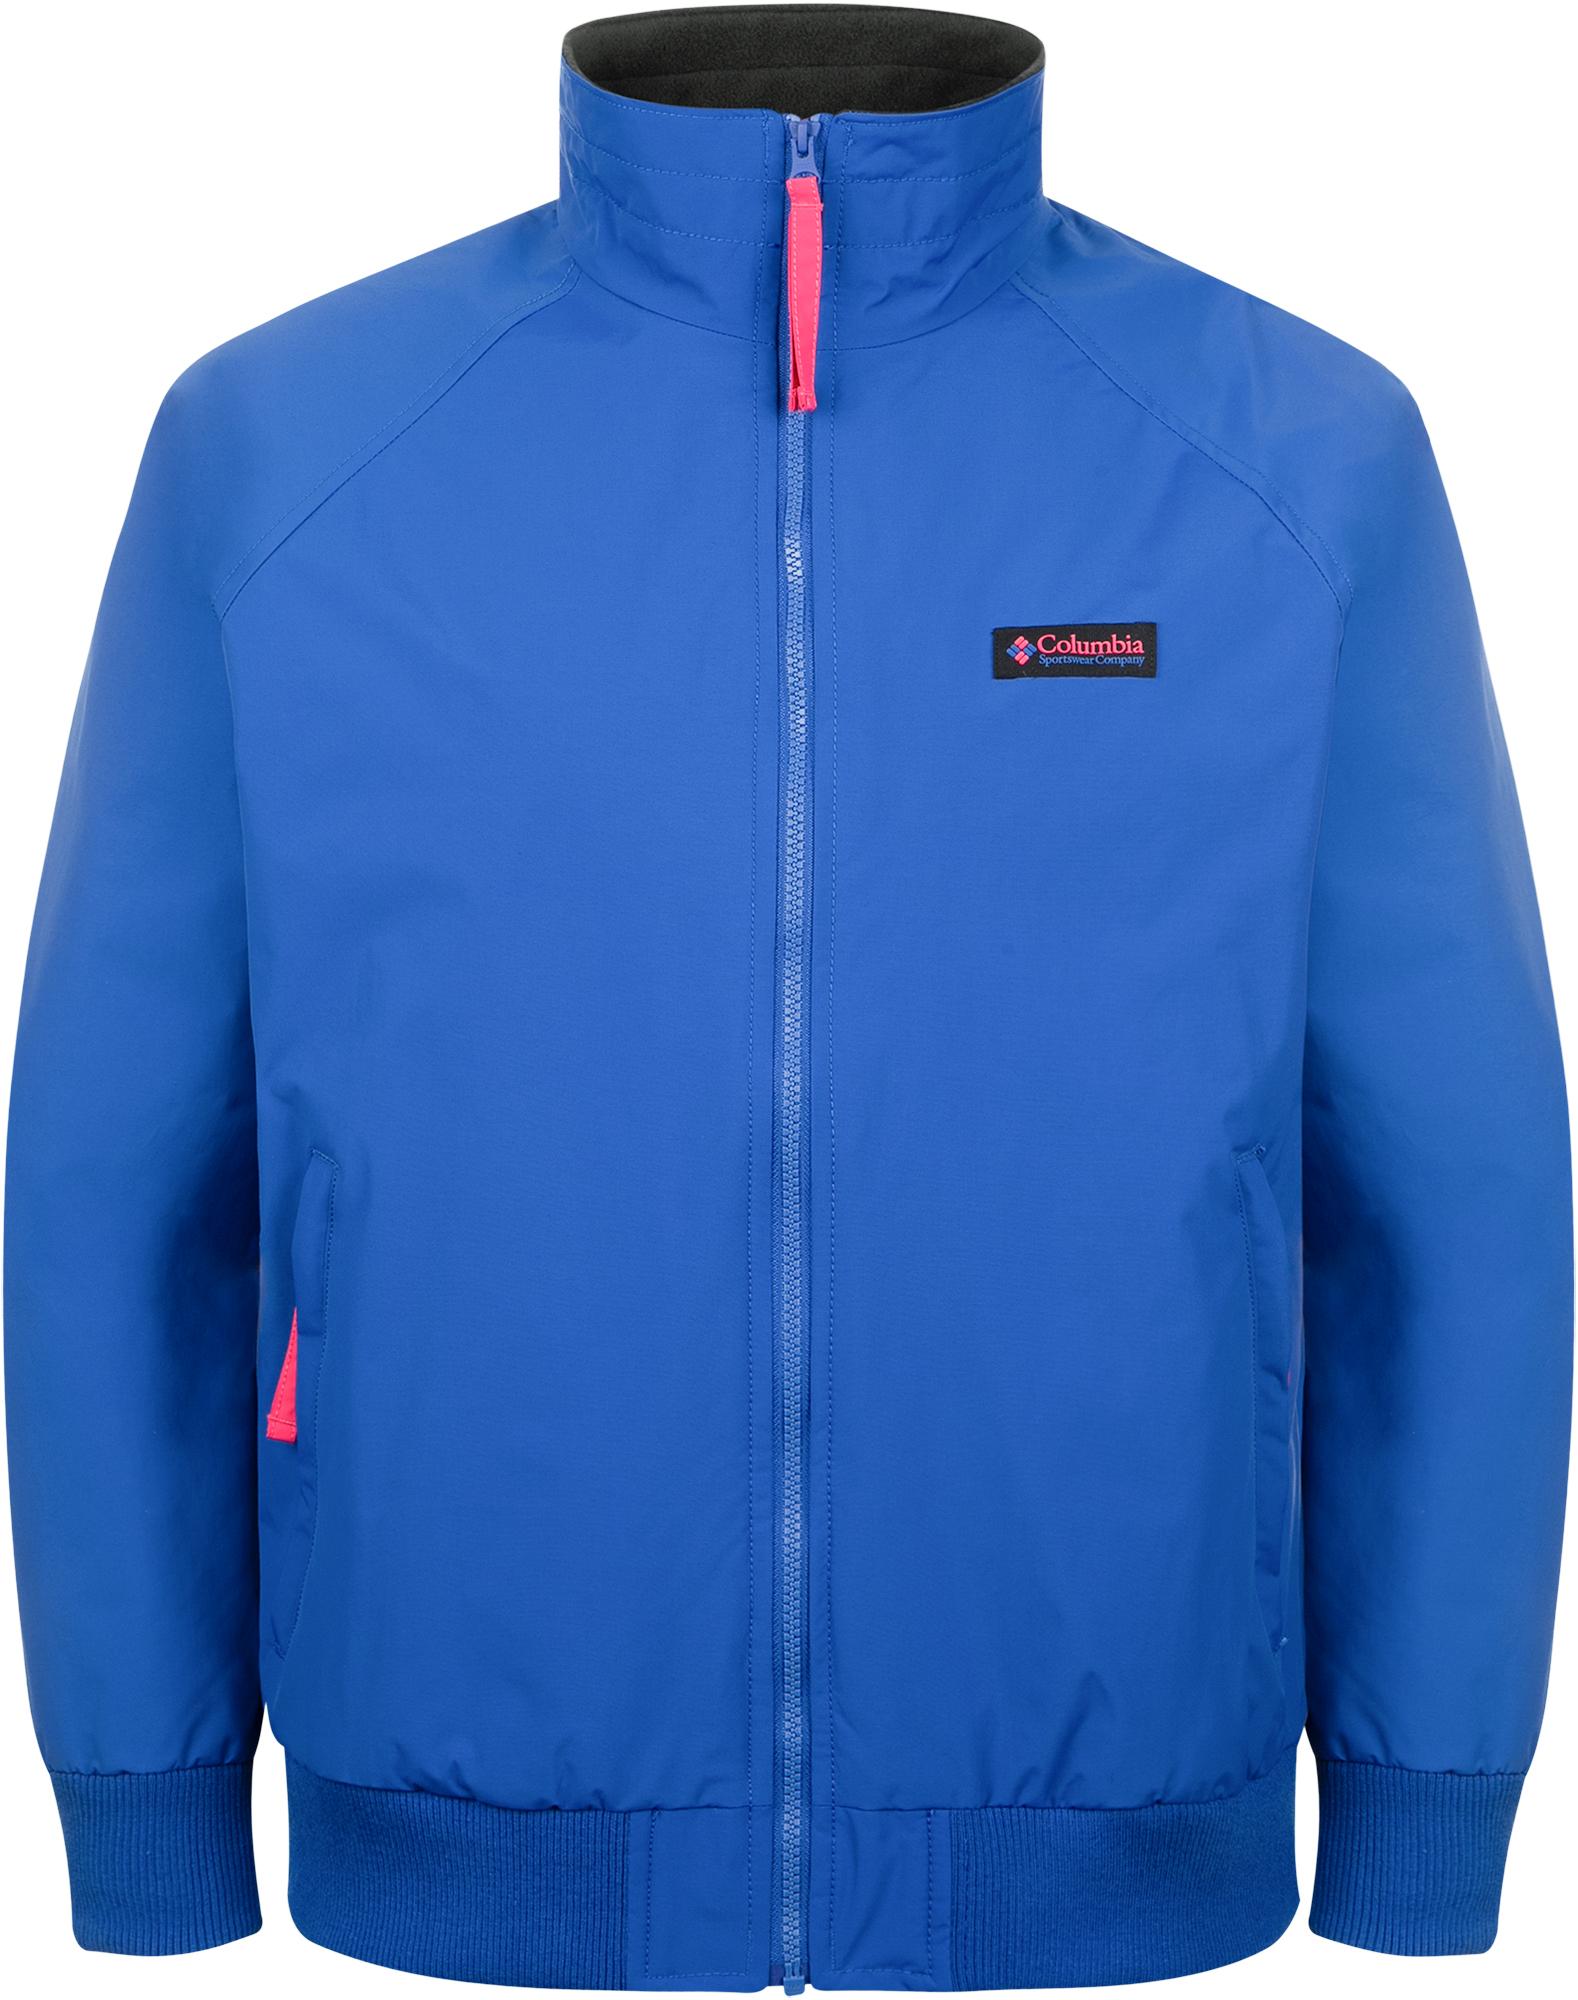 Columbia Куртка Columbia Falmouth™, размер 48-50 columbia куртка columbia falmouth™ размер 48 50